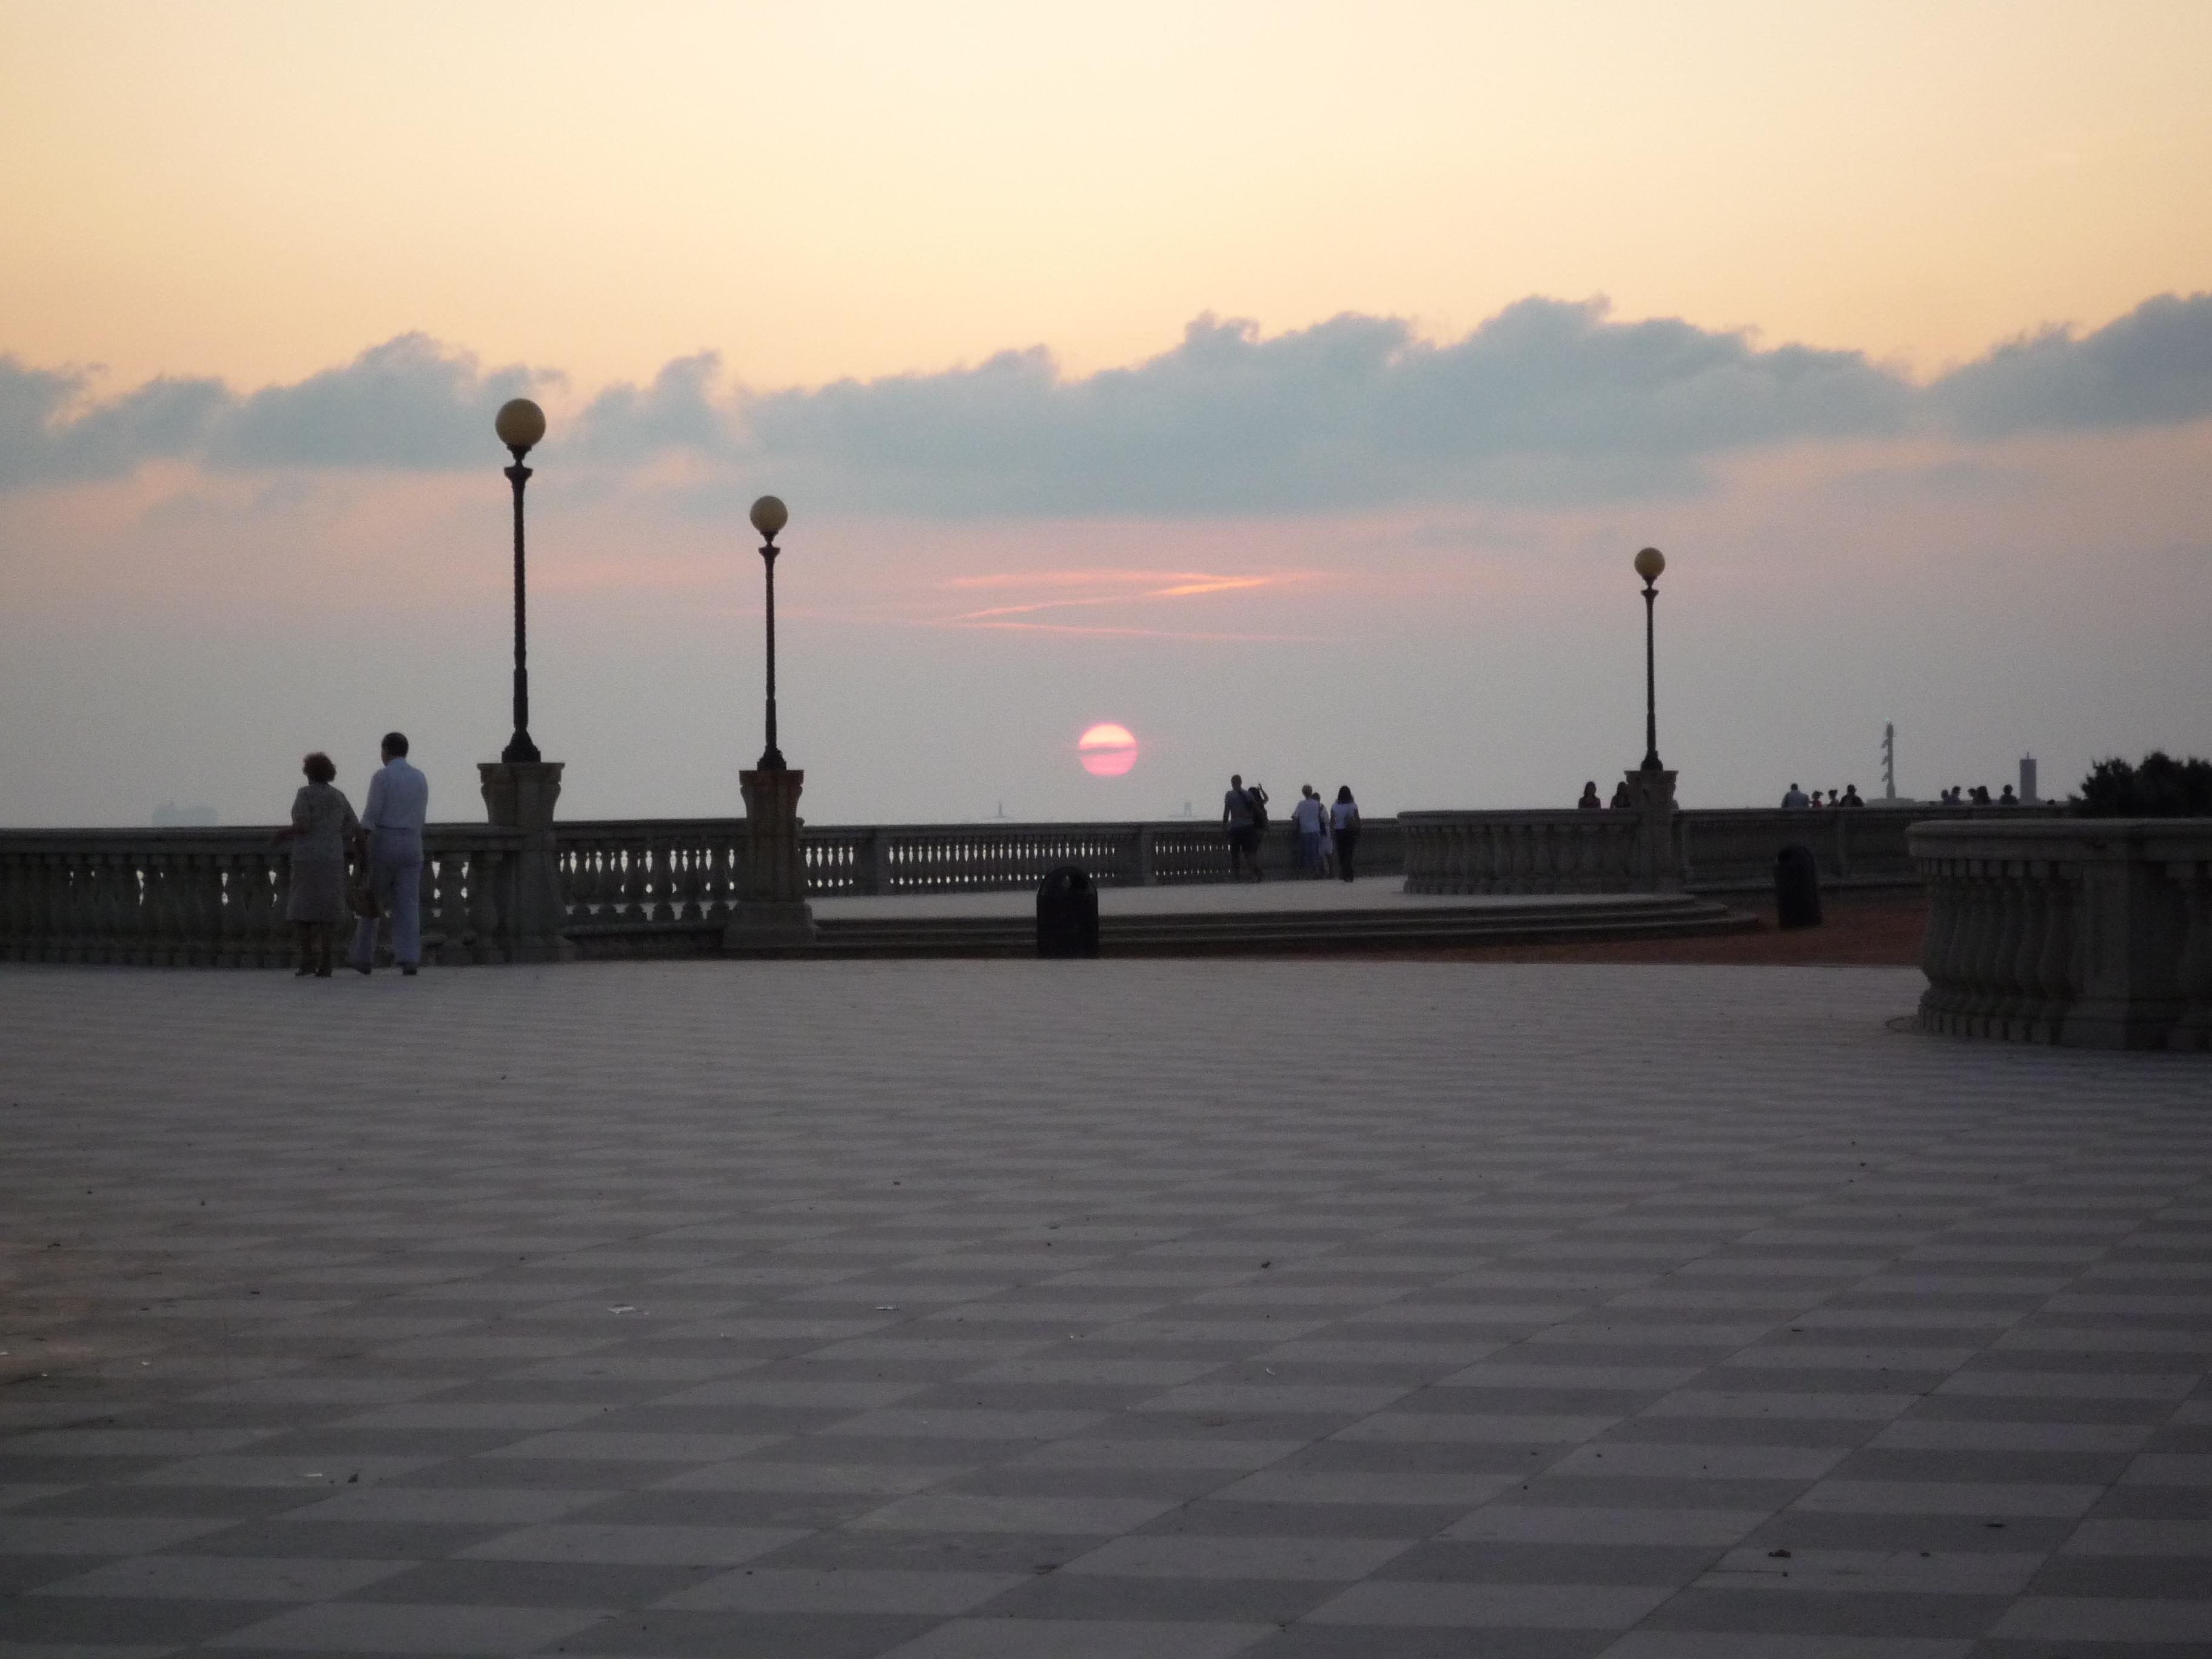 File:Terrazza Mascagni tramonto.JPG - Wikimedia Commons